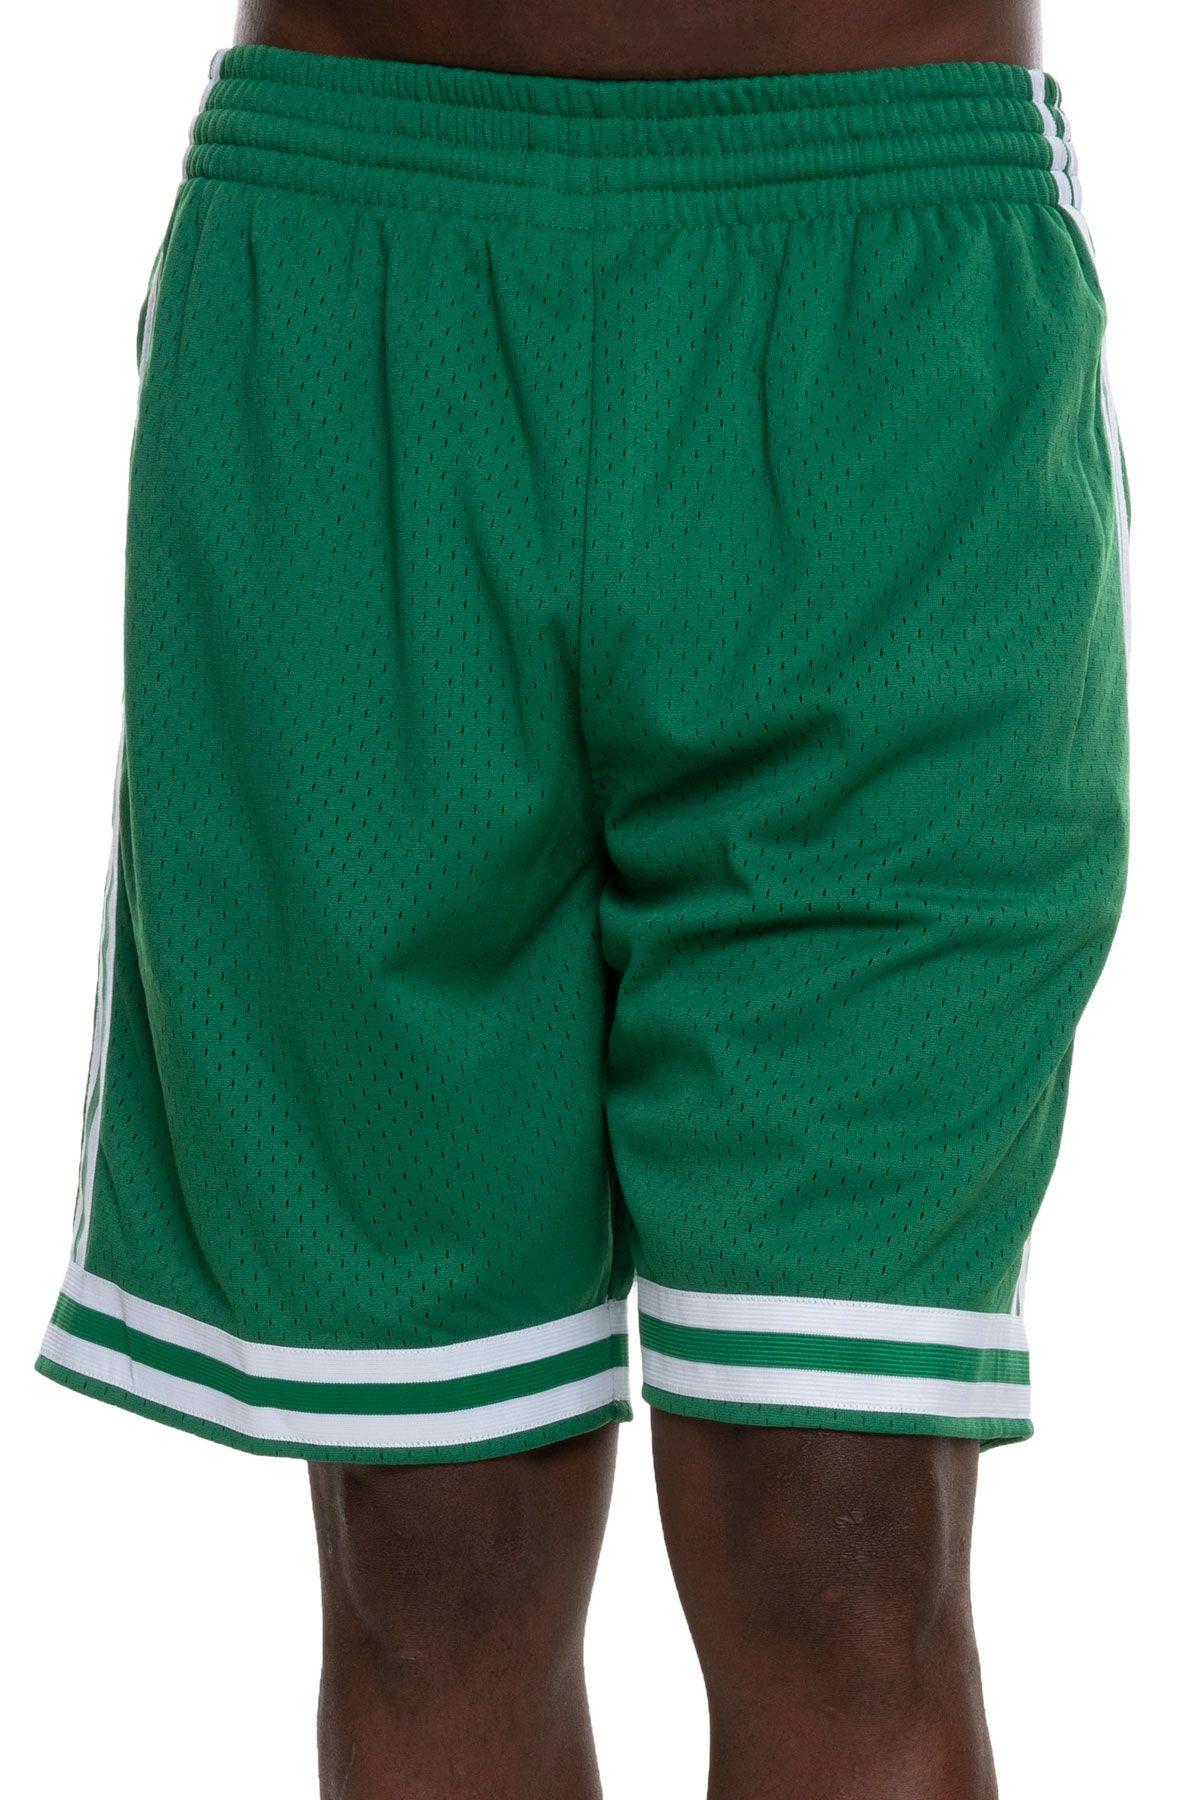 outlet store 362ad 1cae4 Boston Celtics Swingman Shorts